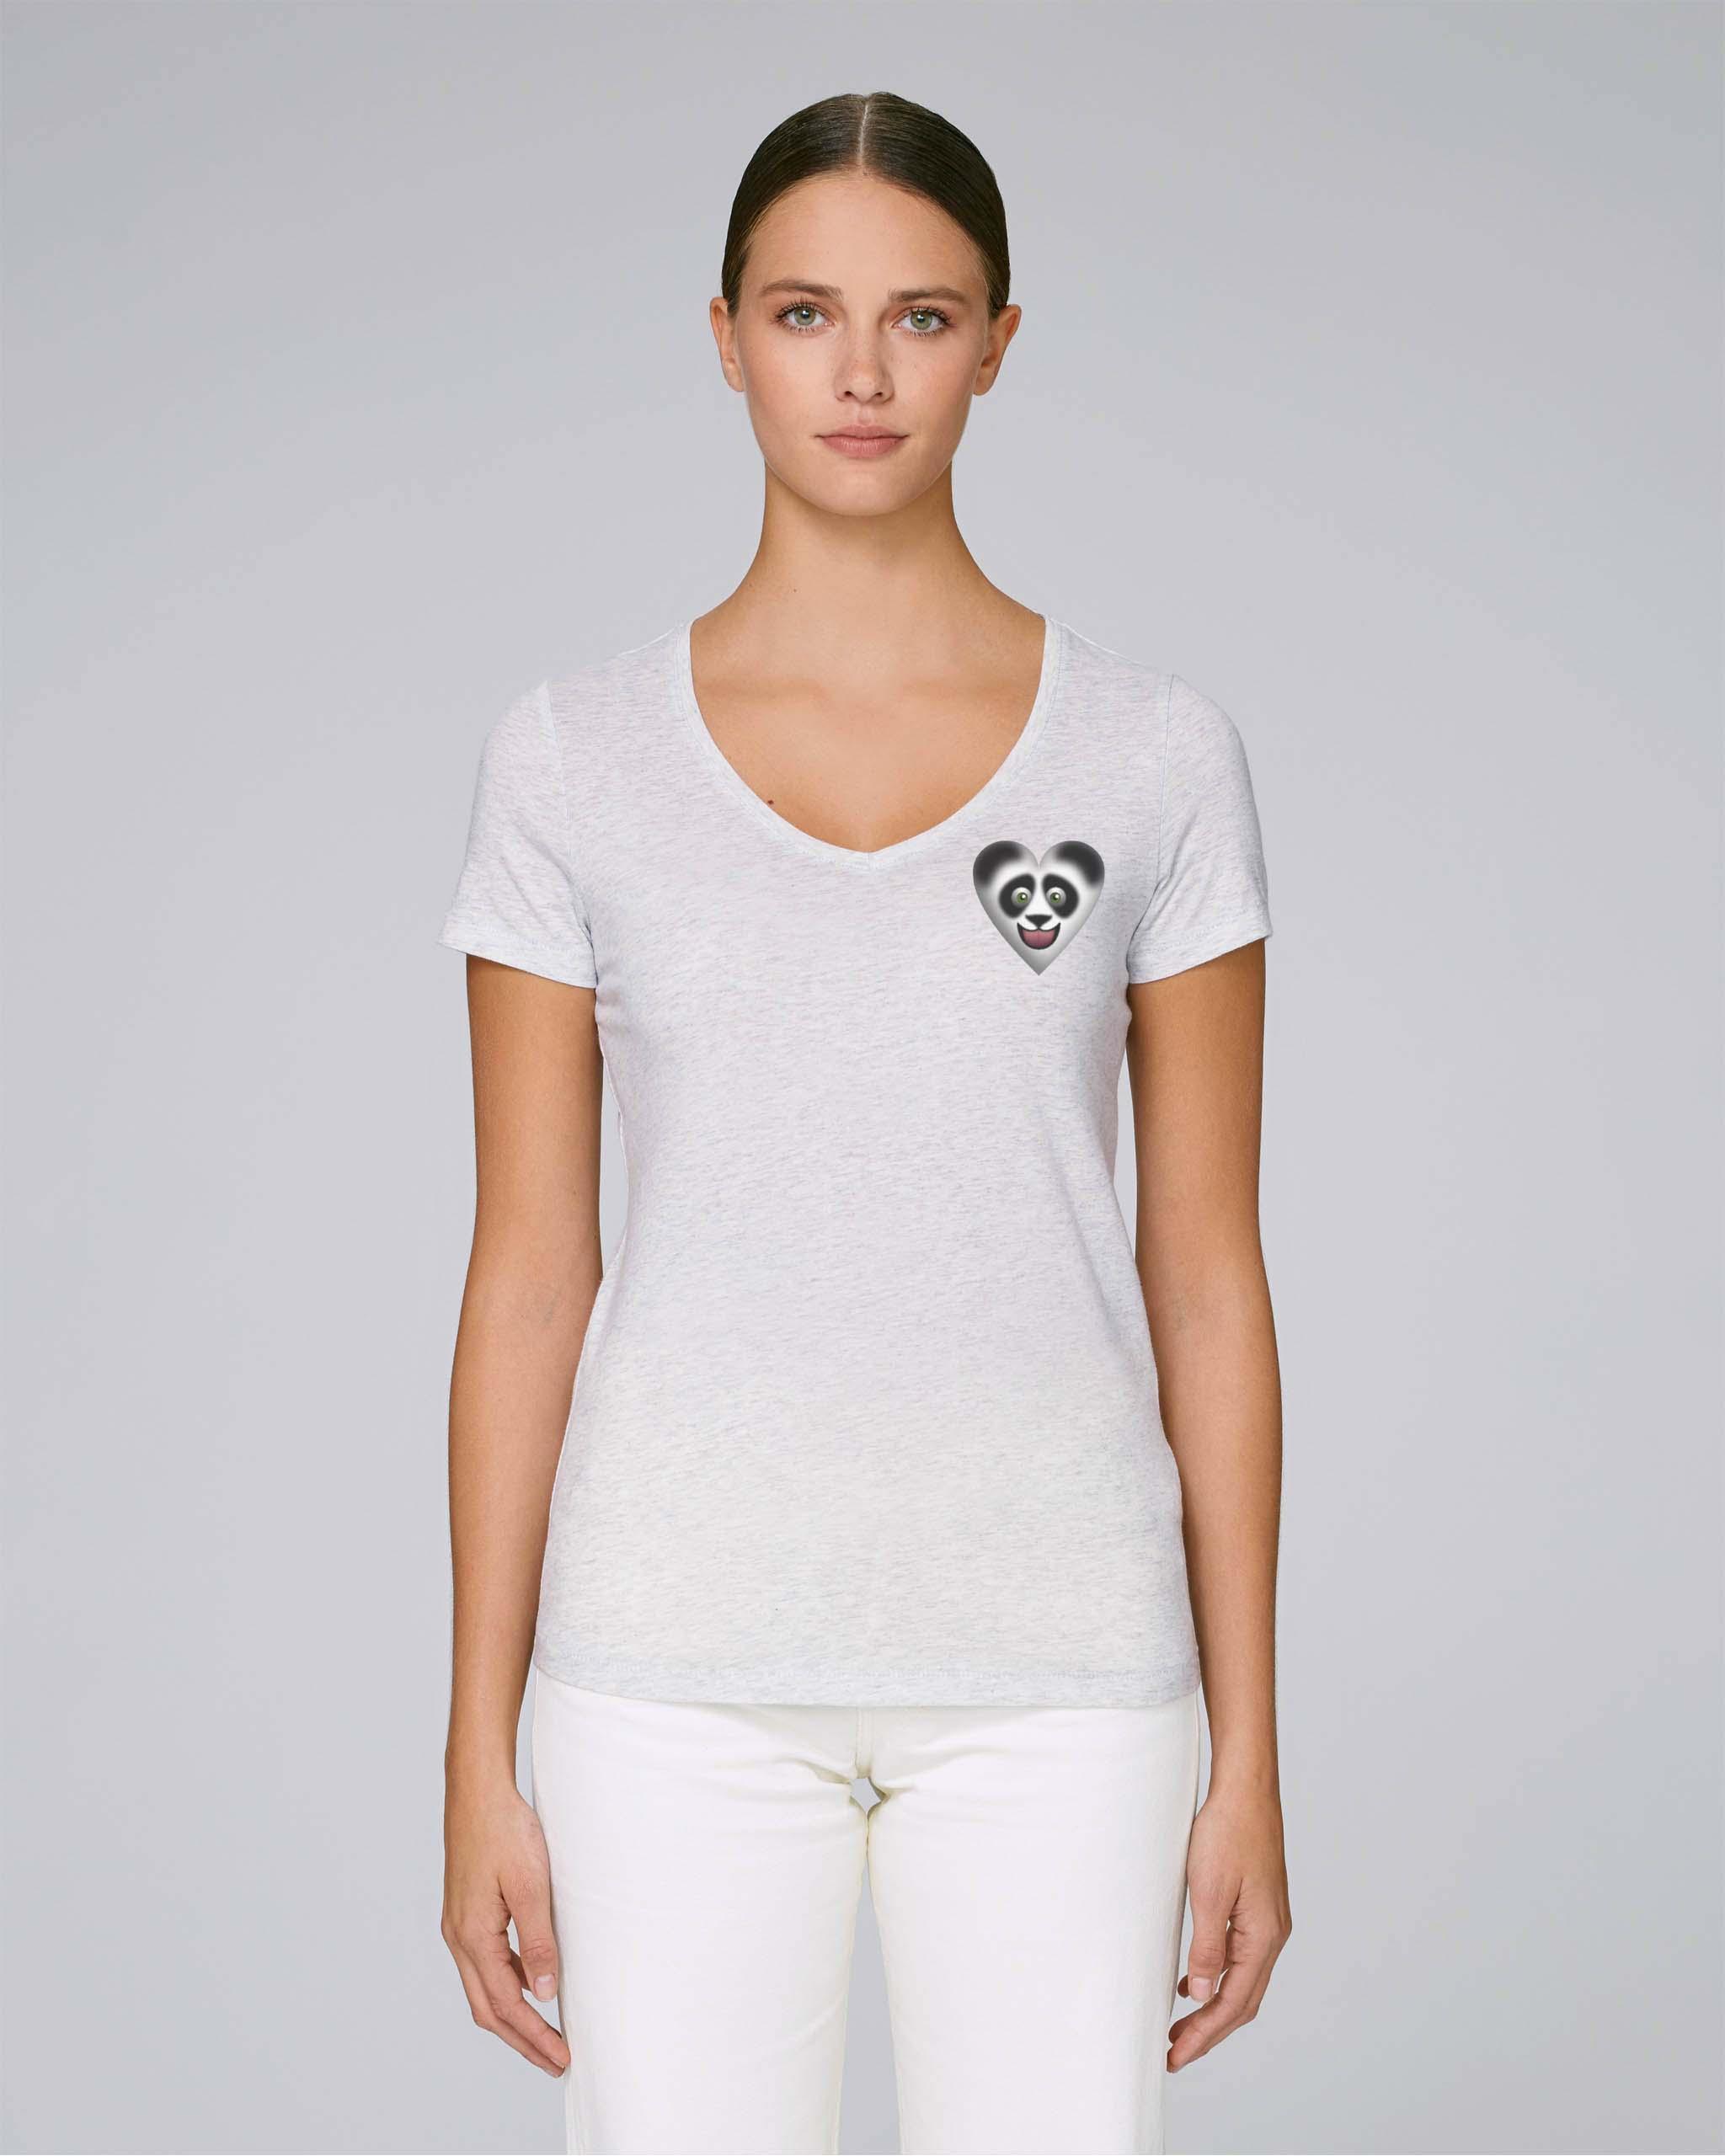 T-Shirt Bio blanc 2 Femme – Panda tee